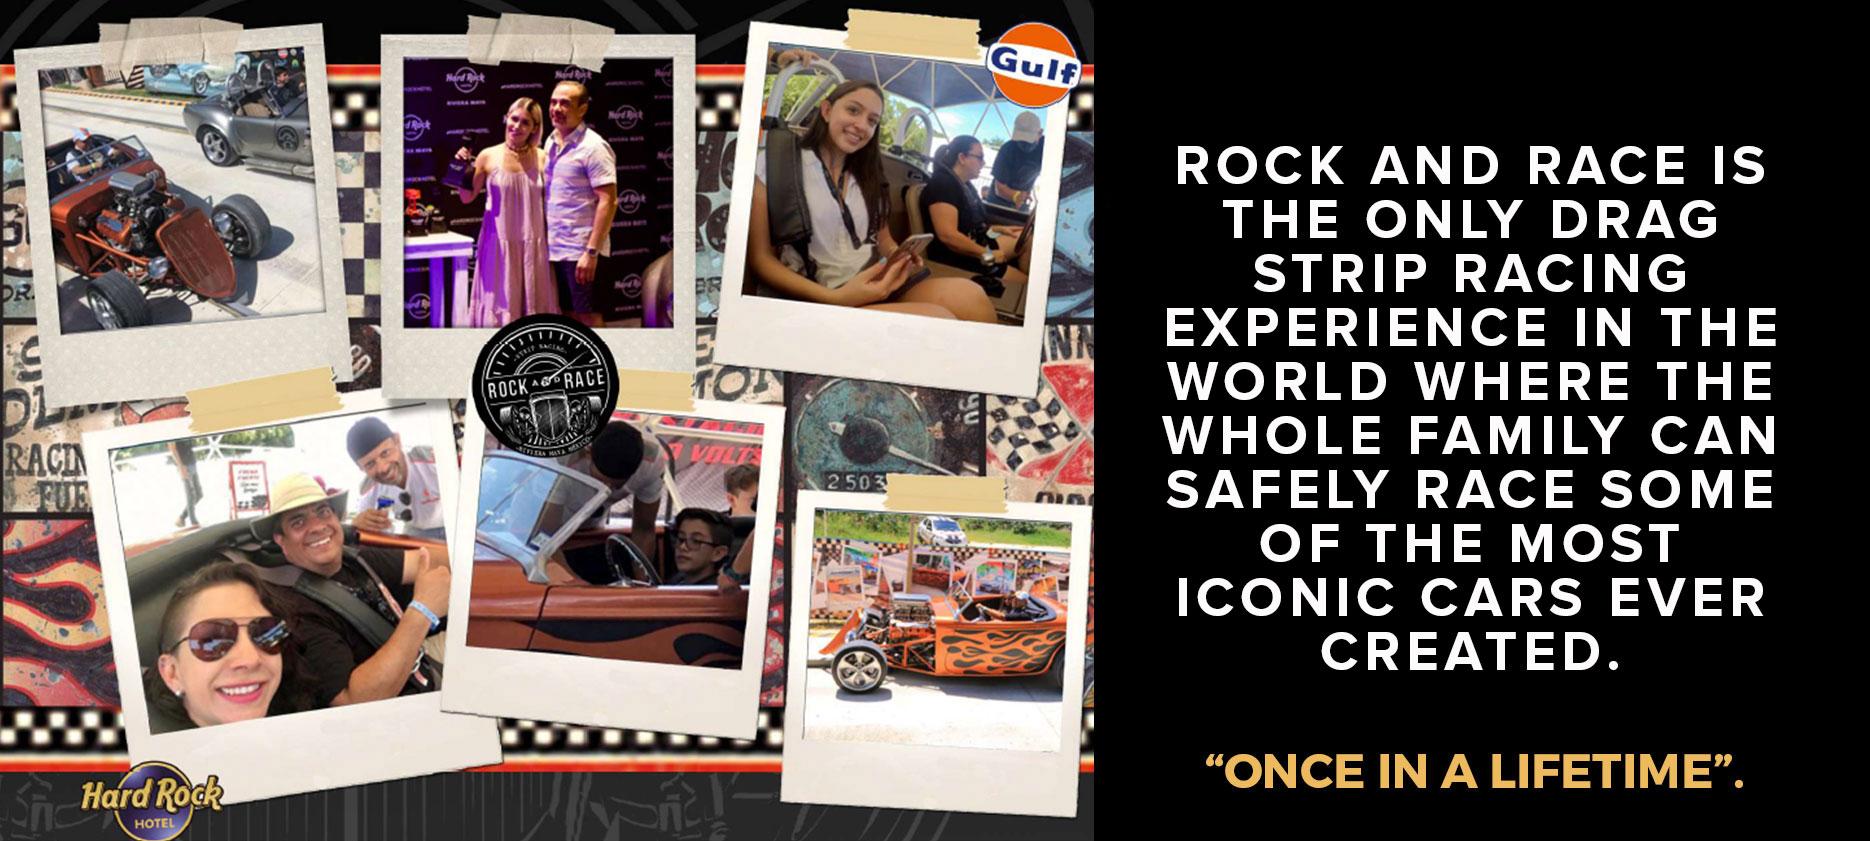 evento-rock-and-race-septiembre-2